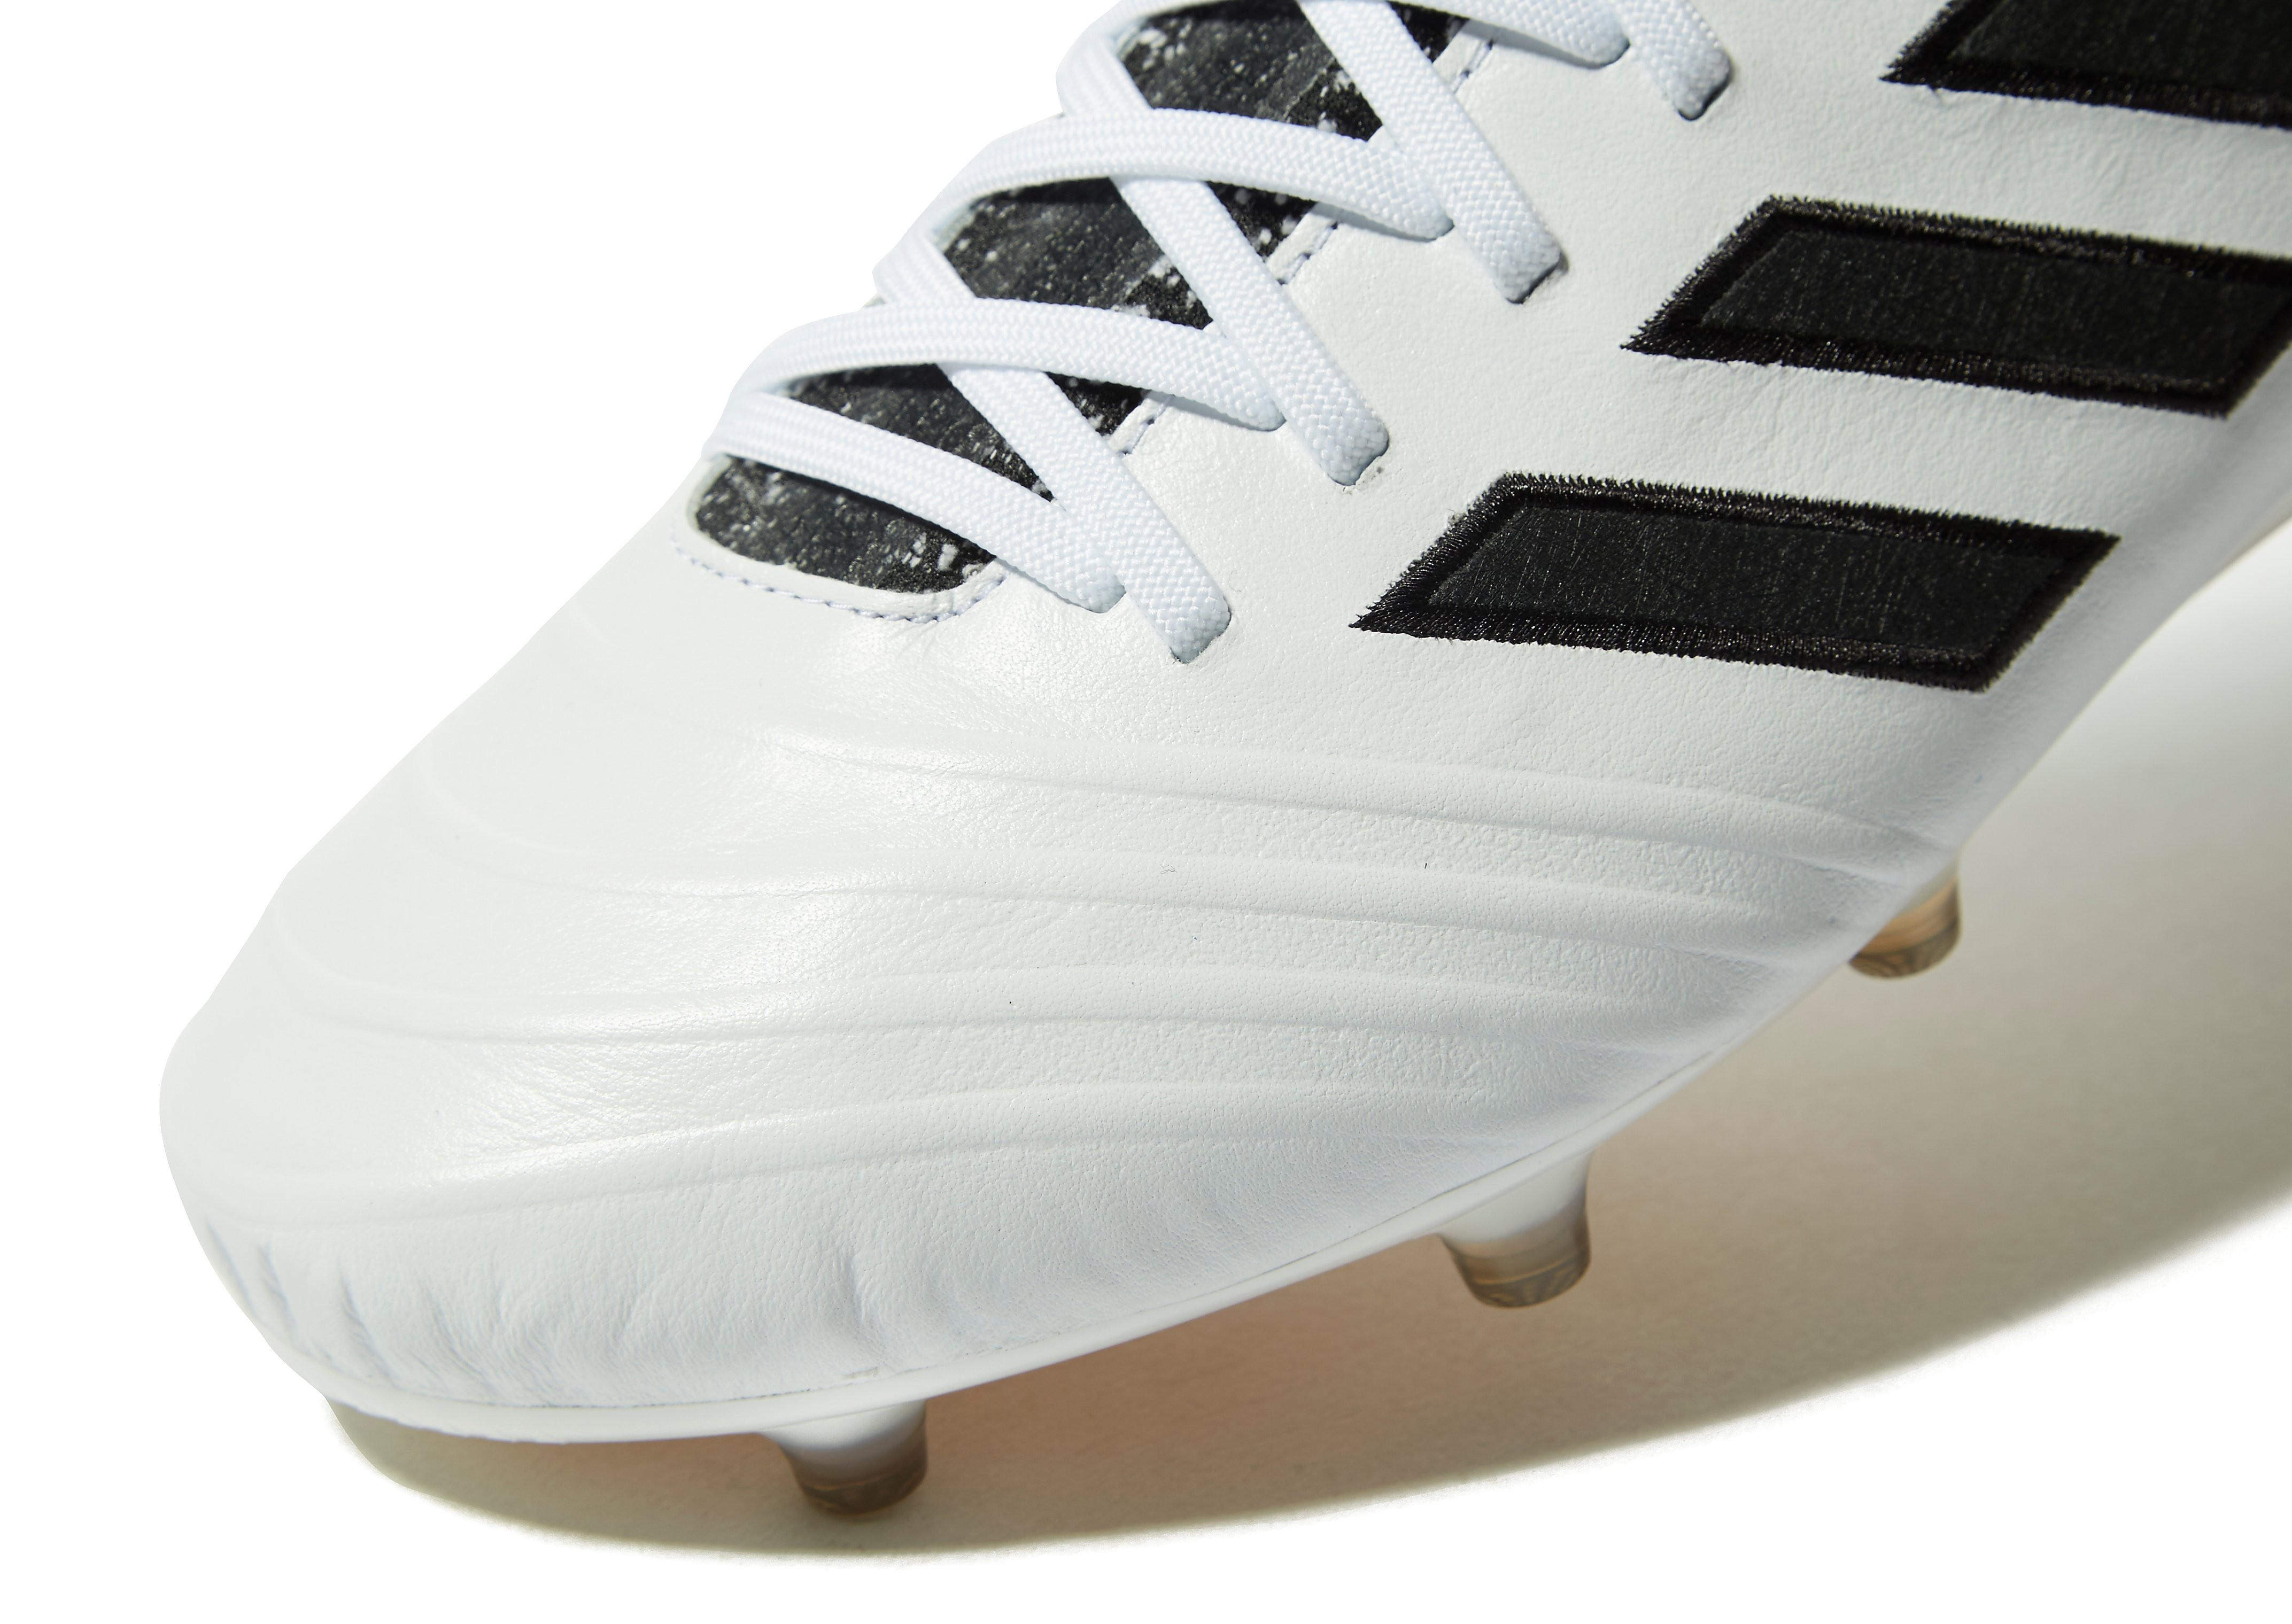 adidas SkyStalker Copa 18.1 FG